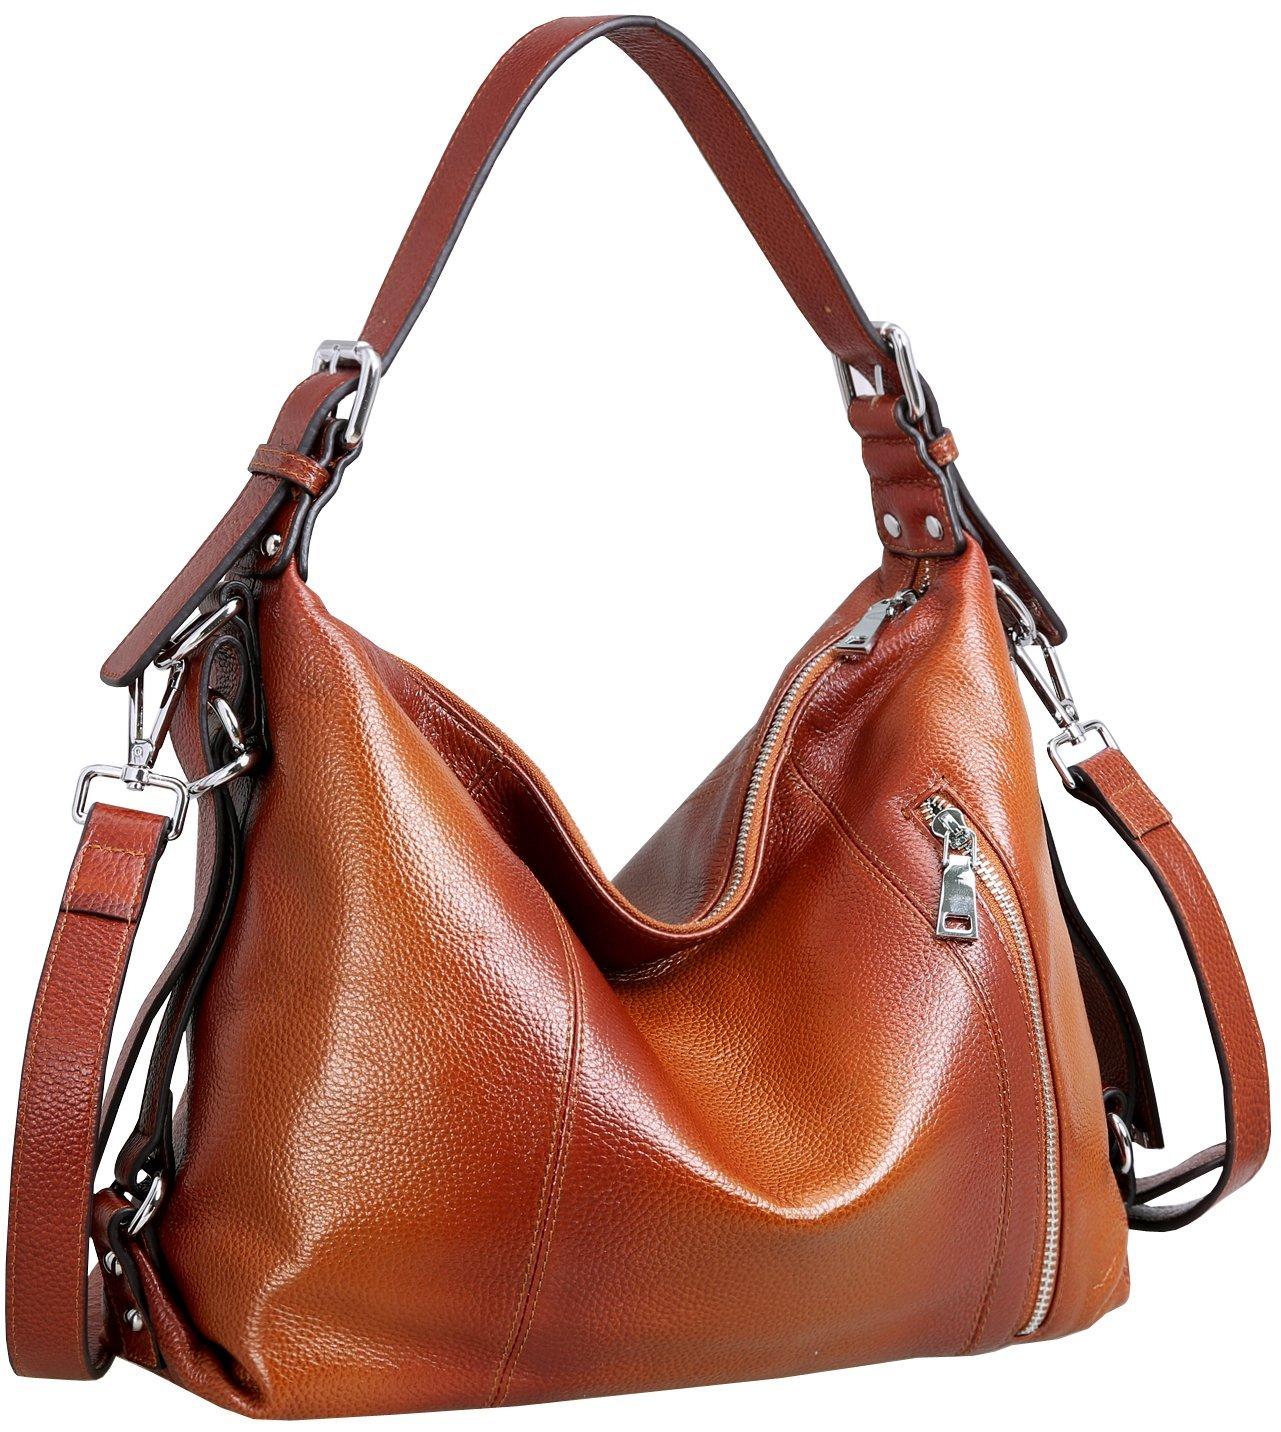 Heshe Vintage Women's Leather Shoulder Handbags Totes Top Handle Bags Cross Body Bag Satchel Handbag Ladies Purses (Sorrel-R)